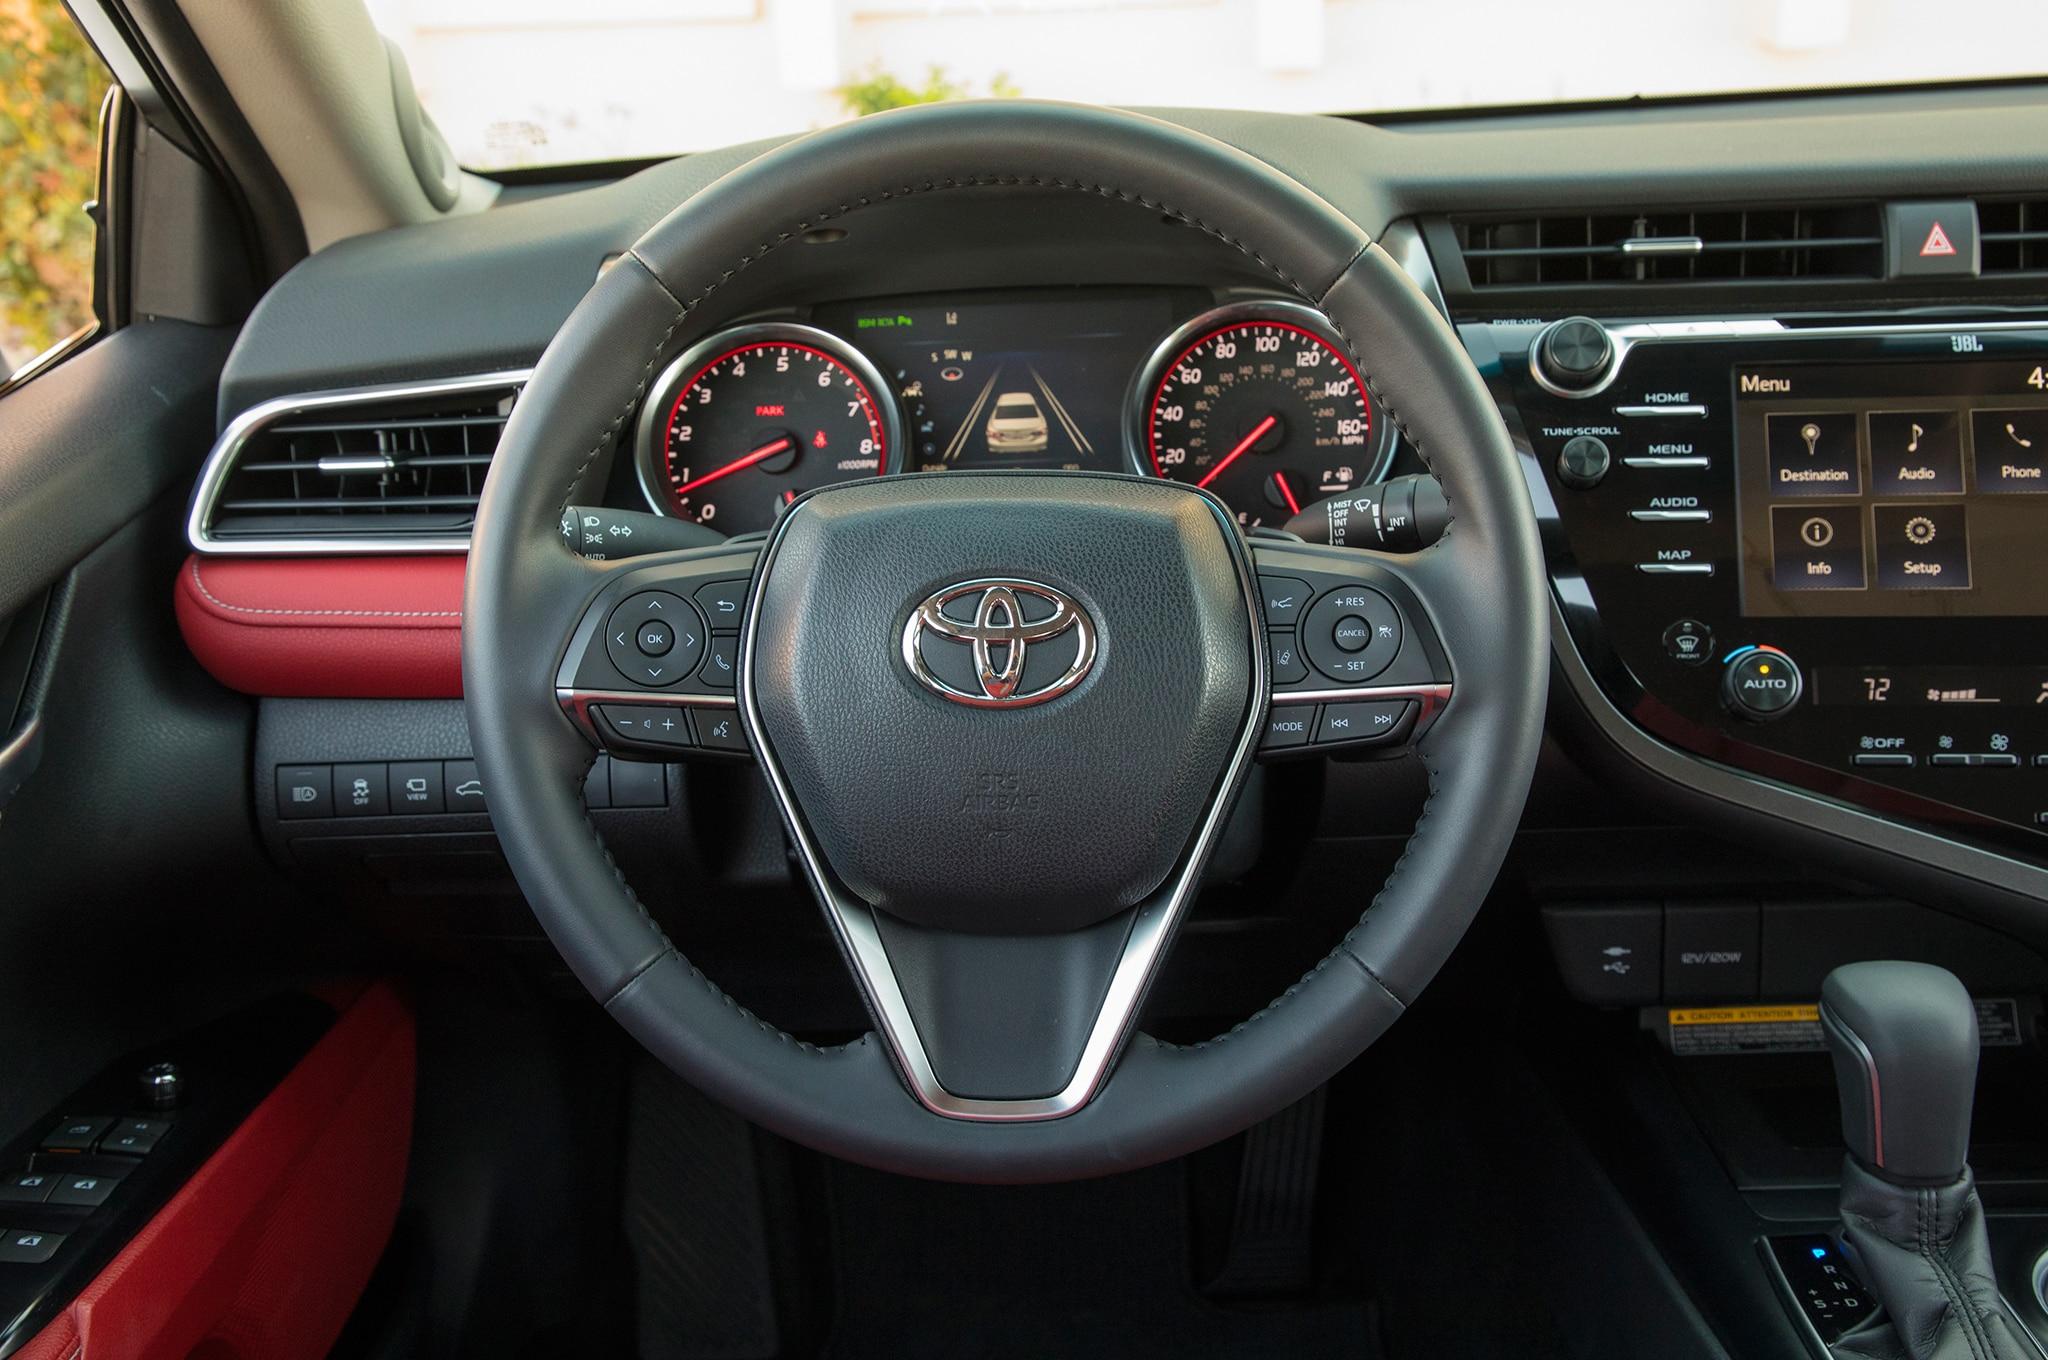 2018 Toyota Camry Xse Steering Wheel 9 Febrero Miguel Cortina